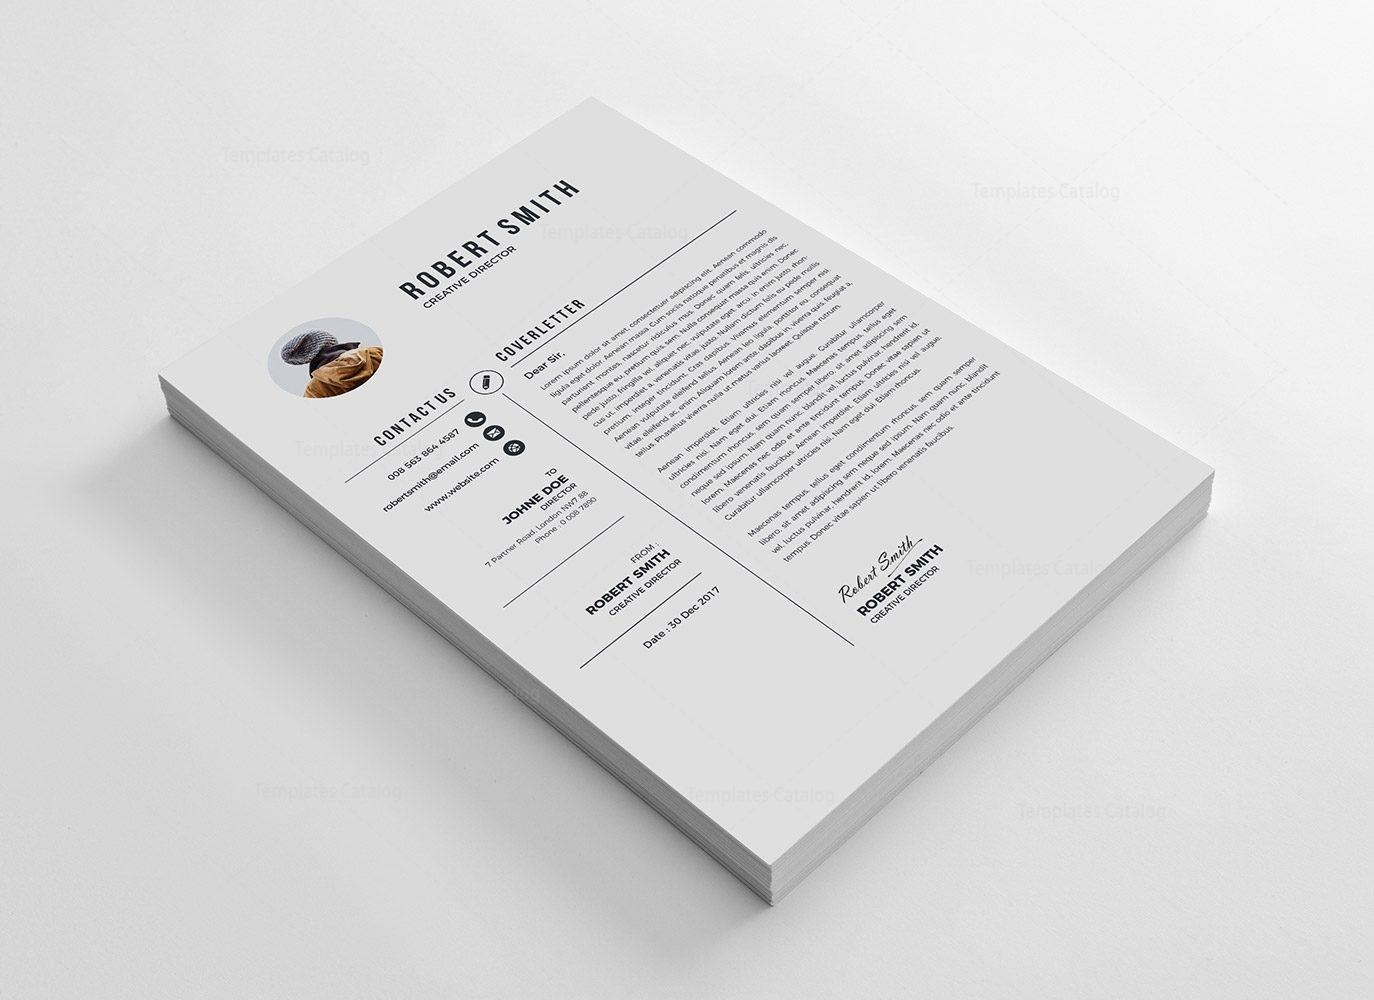 https://www.templatescatalog.com/wp-content/uploads/2017/08/Resume-Template-with-Coverletter-5.jpg